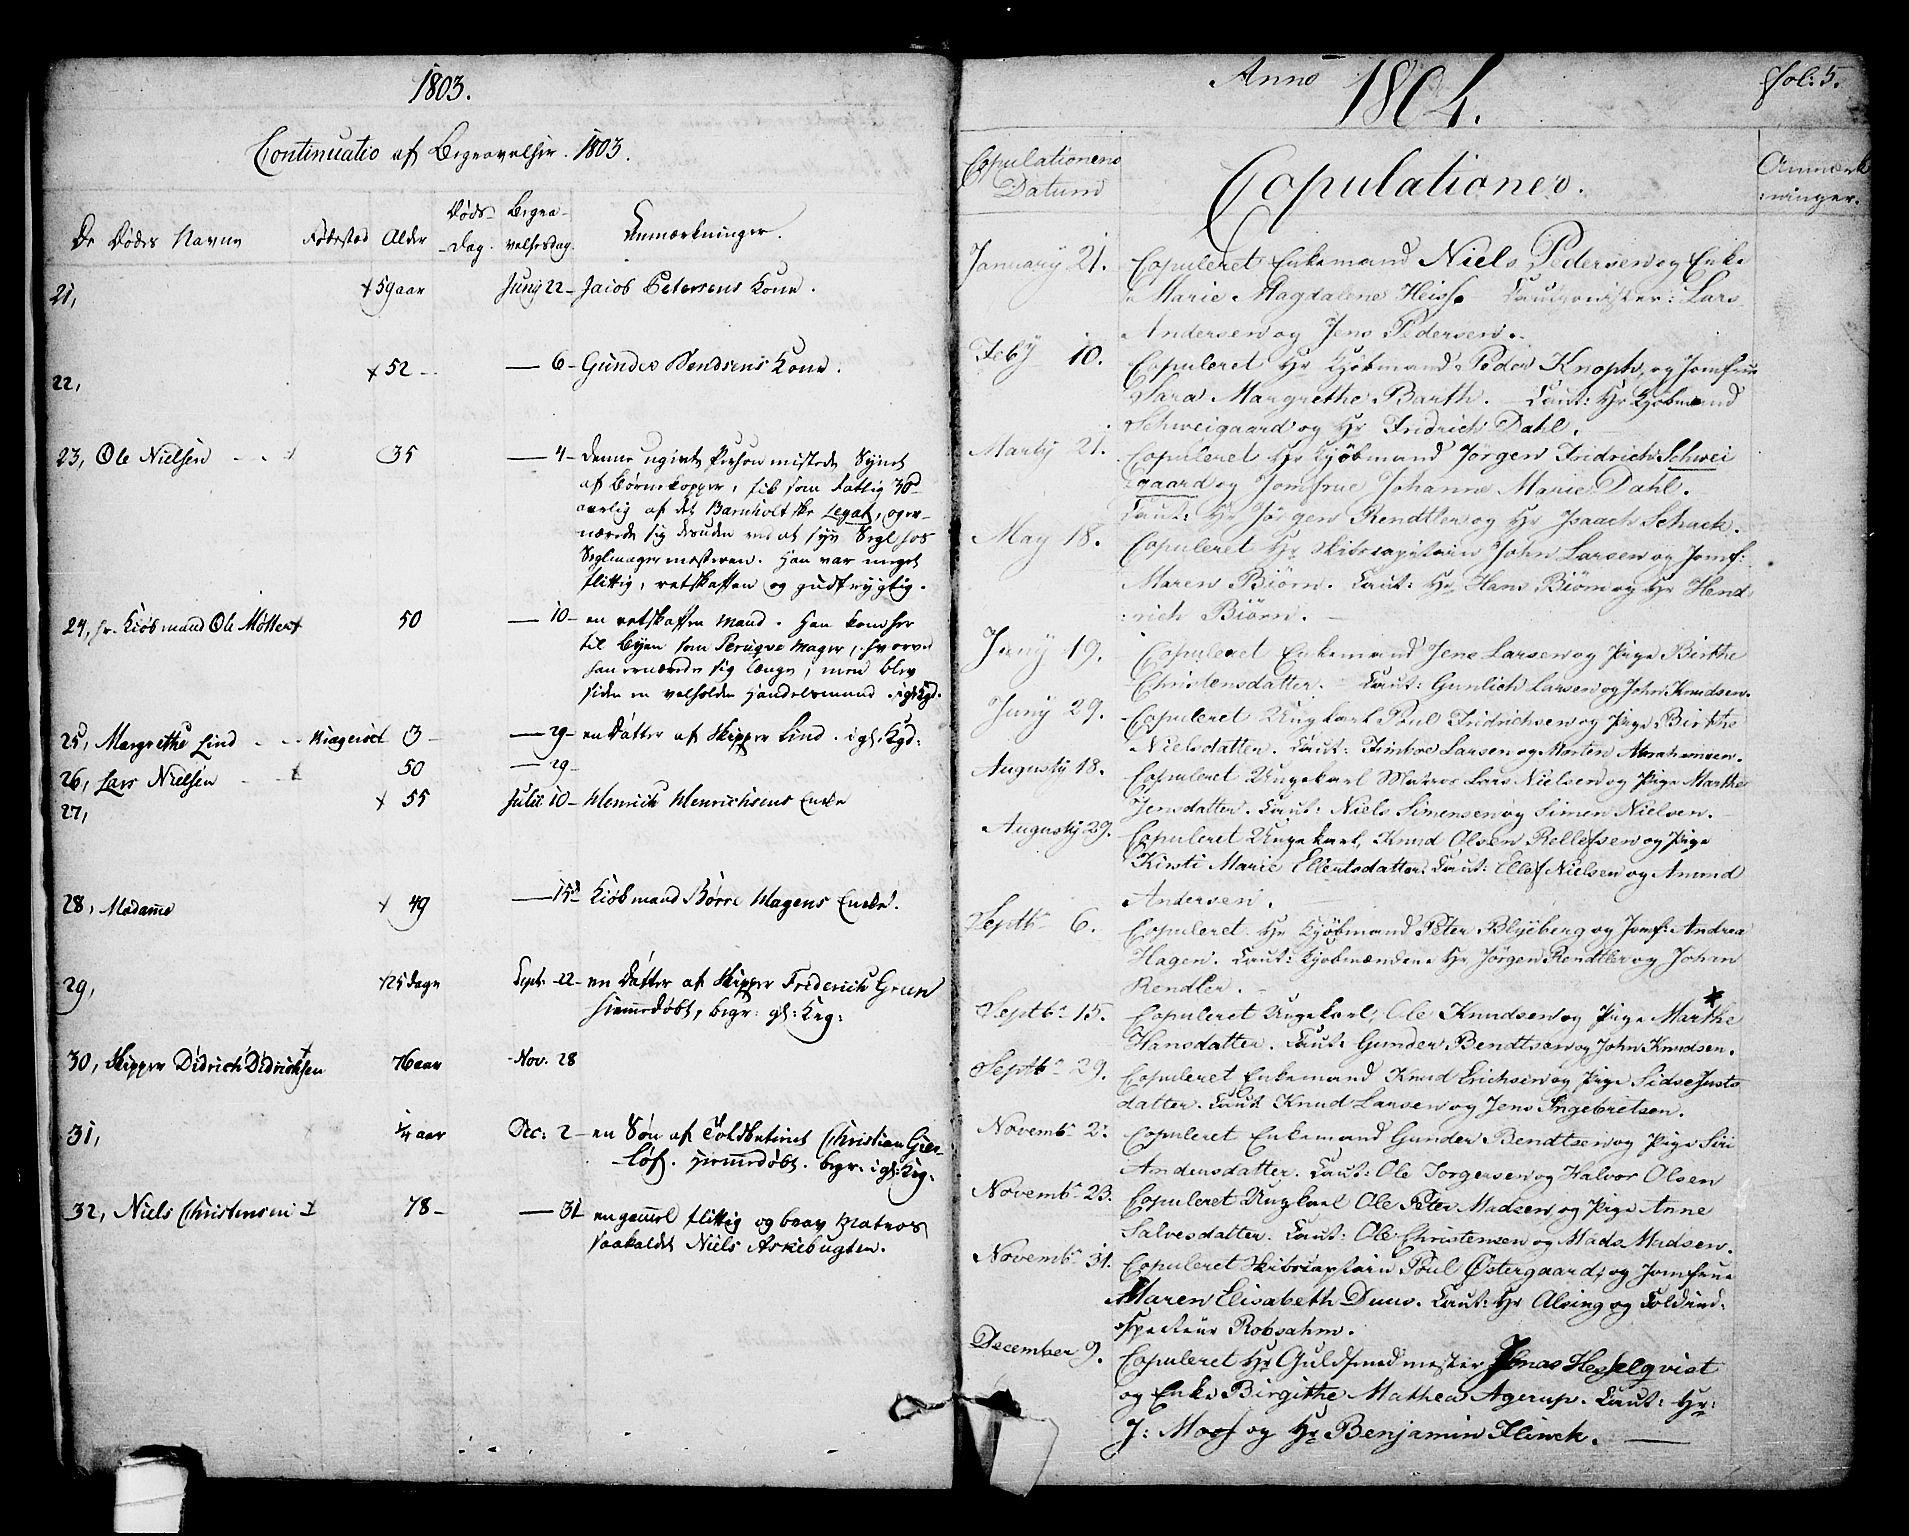 SAKO, Kragerø kirkebøker, F/Fa/L0003: Ministerialbok nr. 3, 1802-1813, s. 5